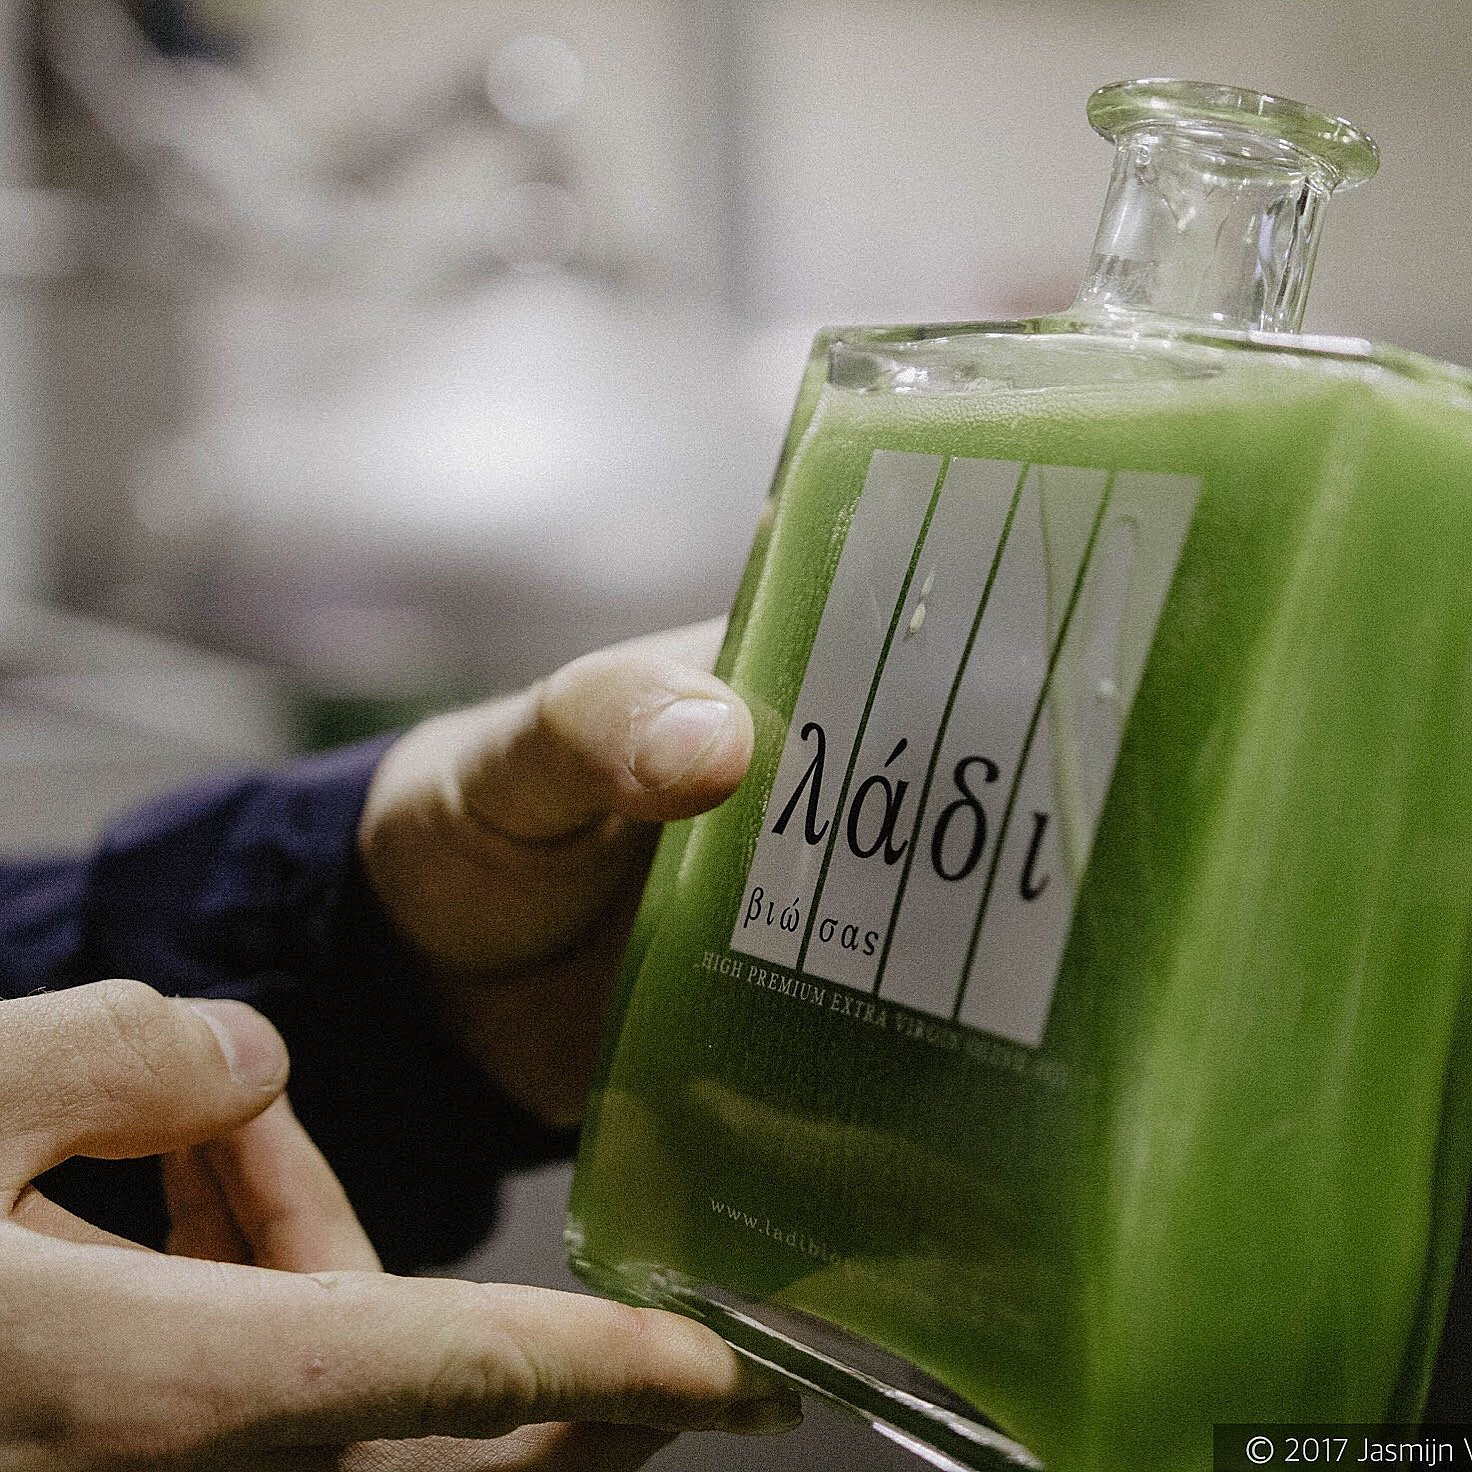 Ladi Biosas λάδι βιώσας Premium Organic Extra Virgin Olive Oil - 250ml